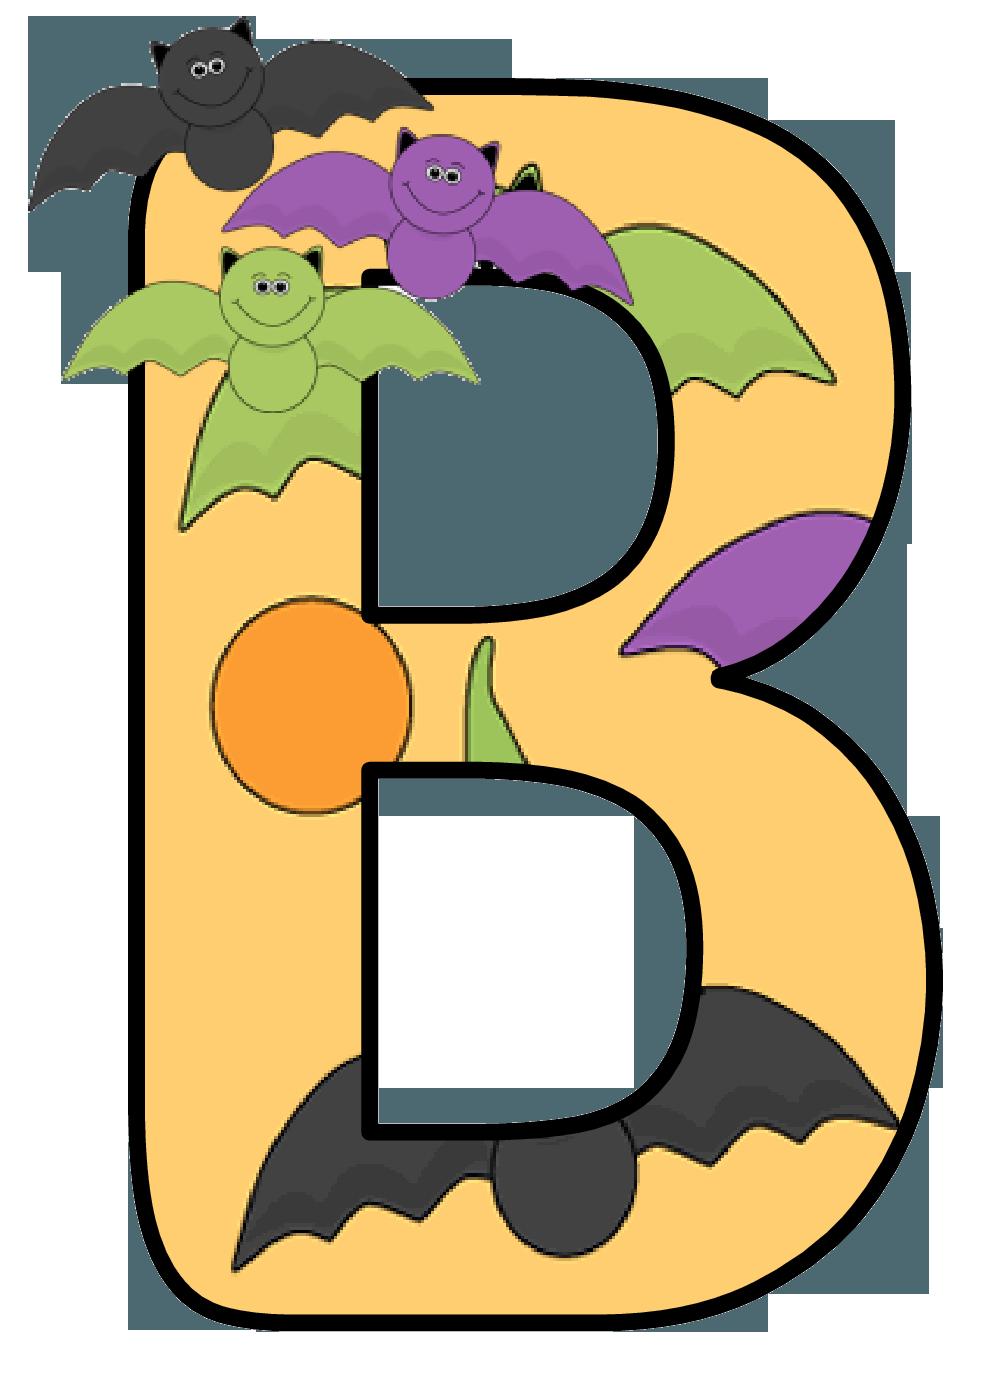 Ch b alfabeto murcielago. Soup clipart halloween